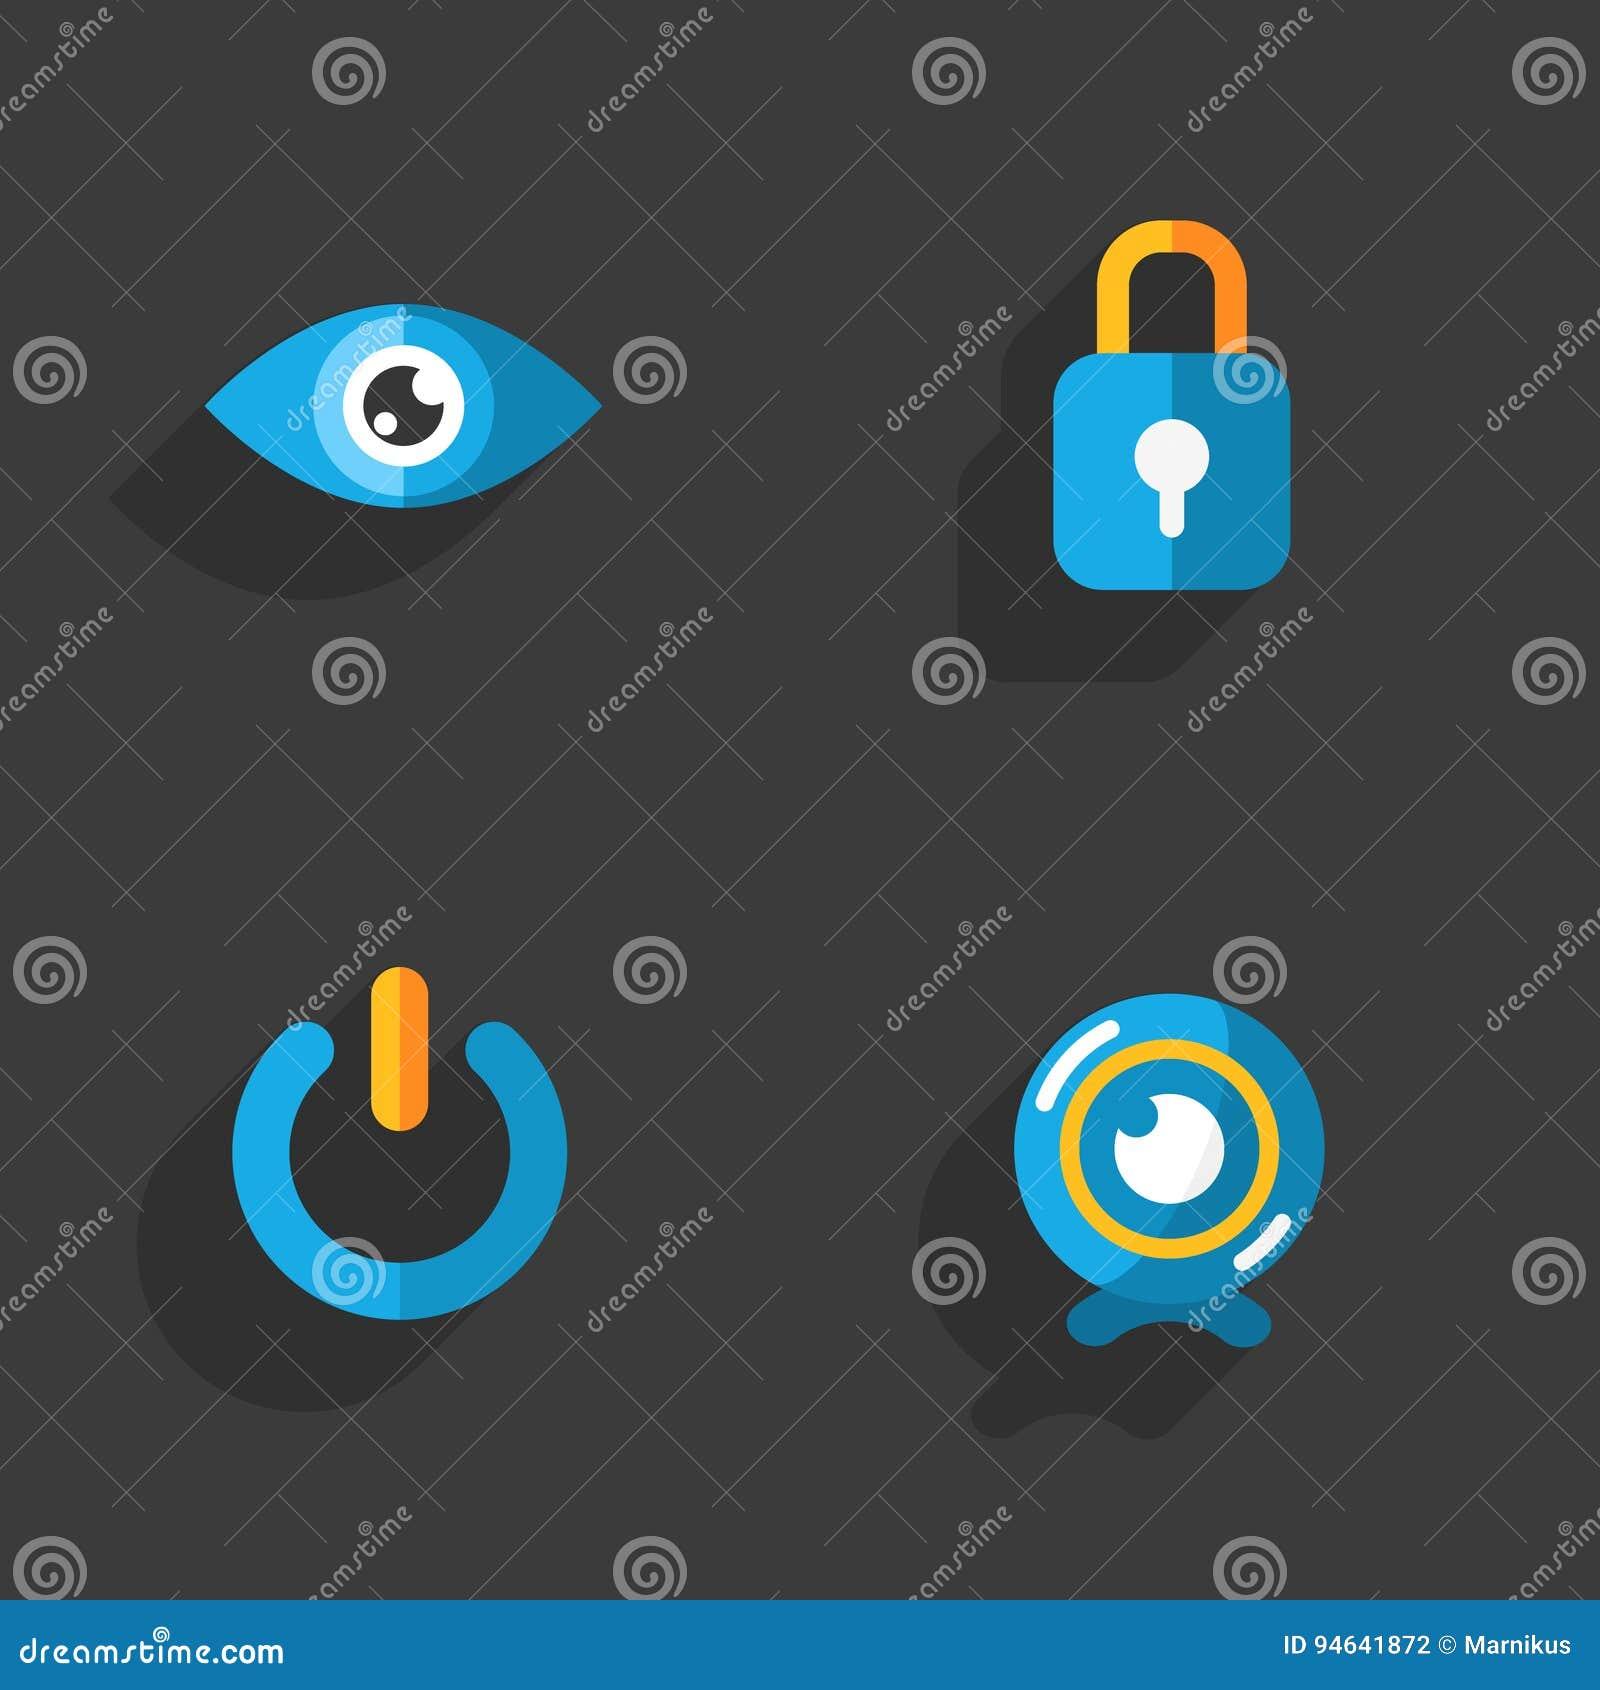 Visioncolor profile download | Cinestyle, Prolost, Marvels & More